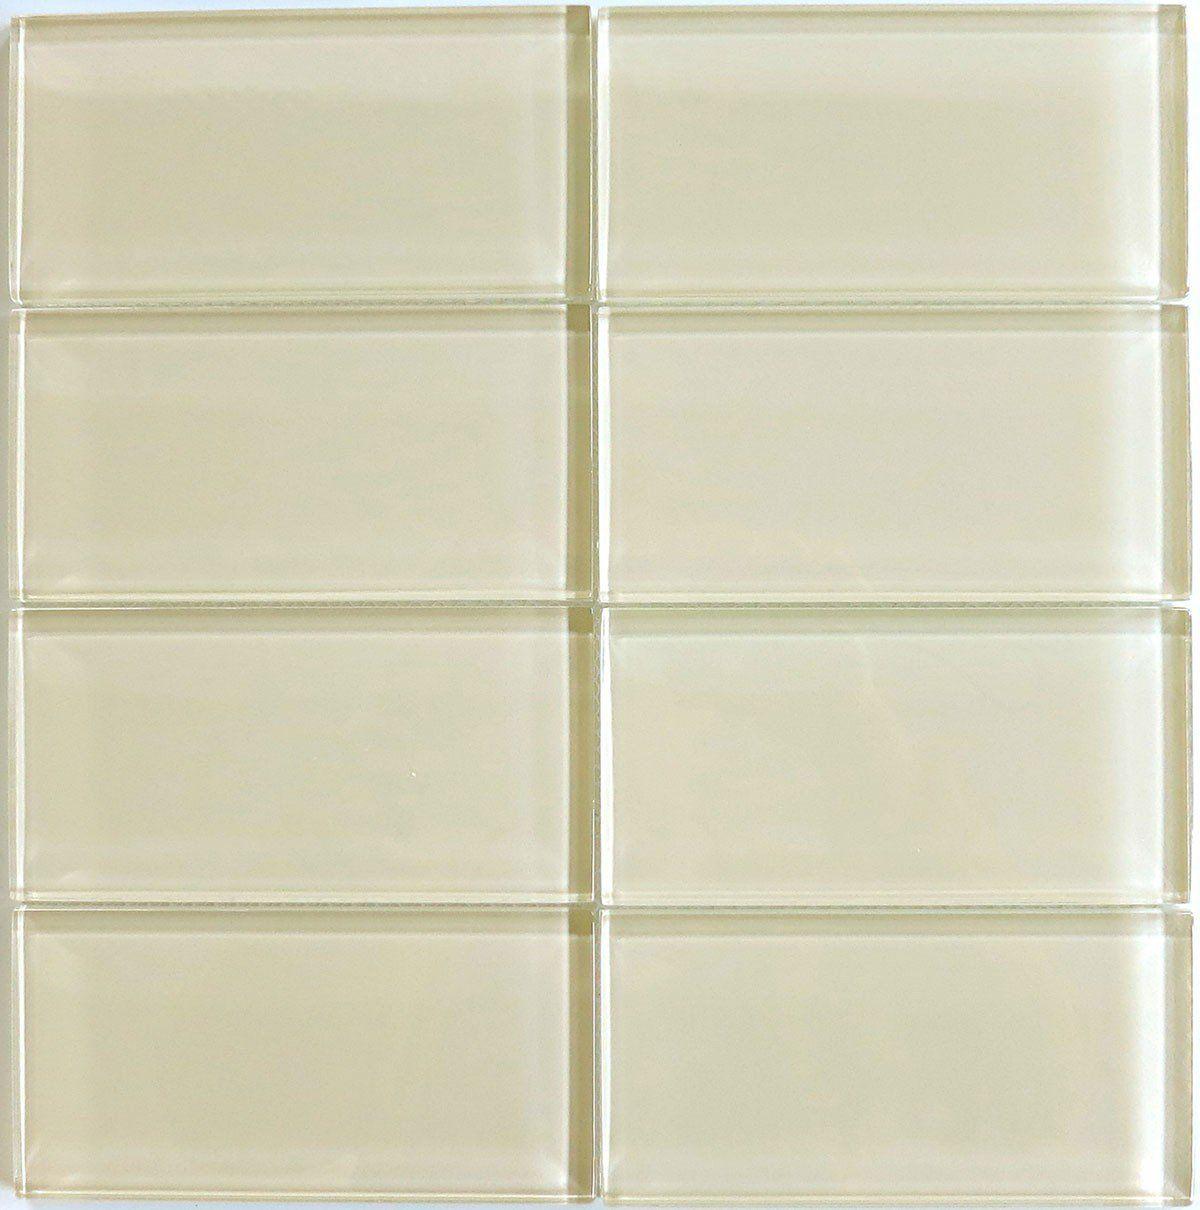 Lush 3x6 cameo cream glass subway tile lush 3x6 subway tile lush 3x6 cameo cream glass subway tile lush 3x6 subway tile cameo dailygadgetfo Choice Image